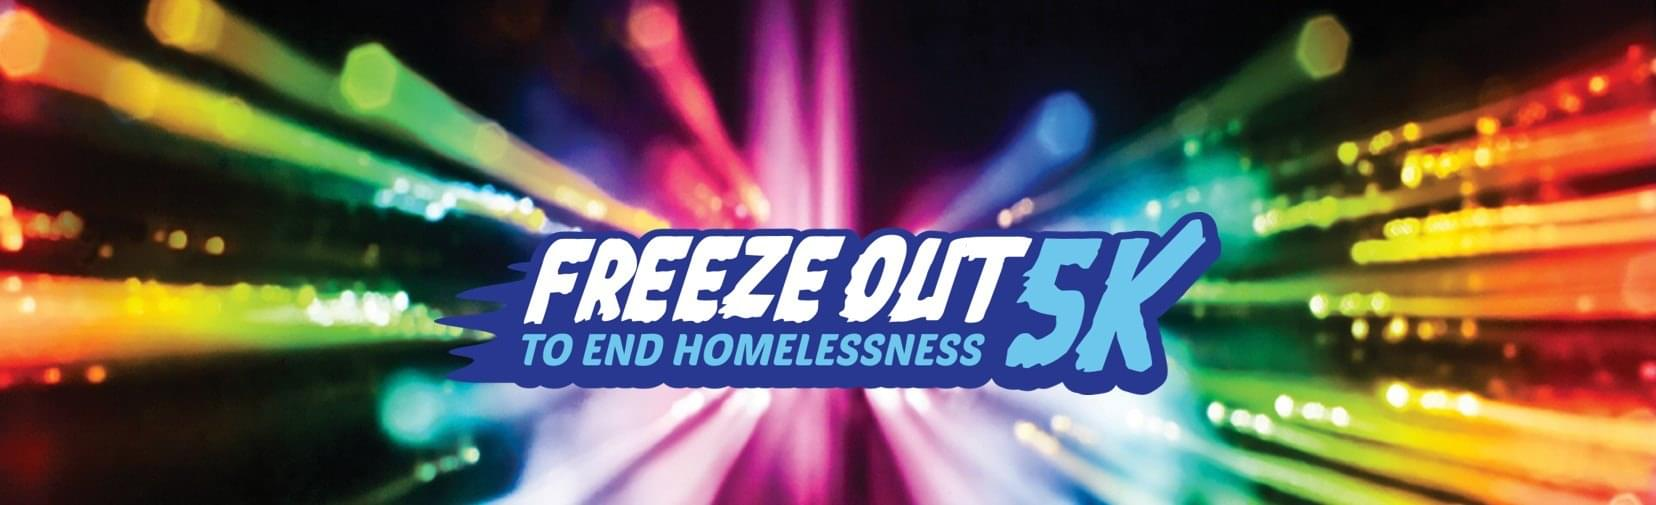 Syracuse Freeze Out 5K 2020   February 21st